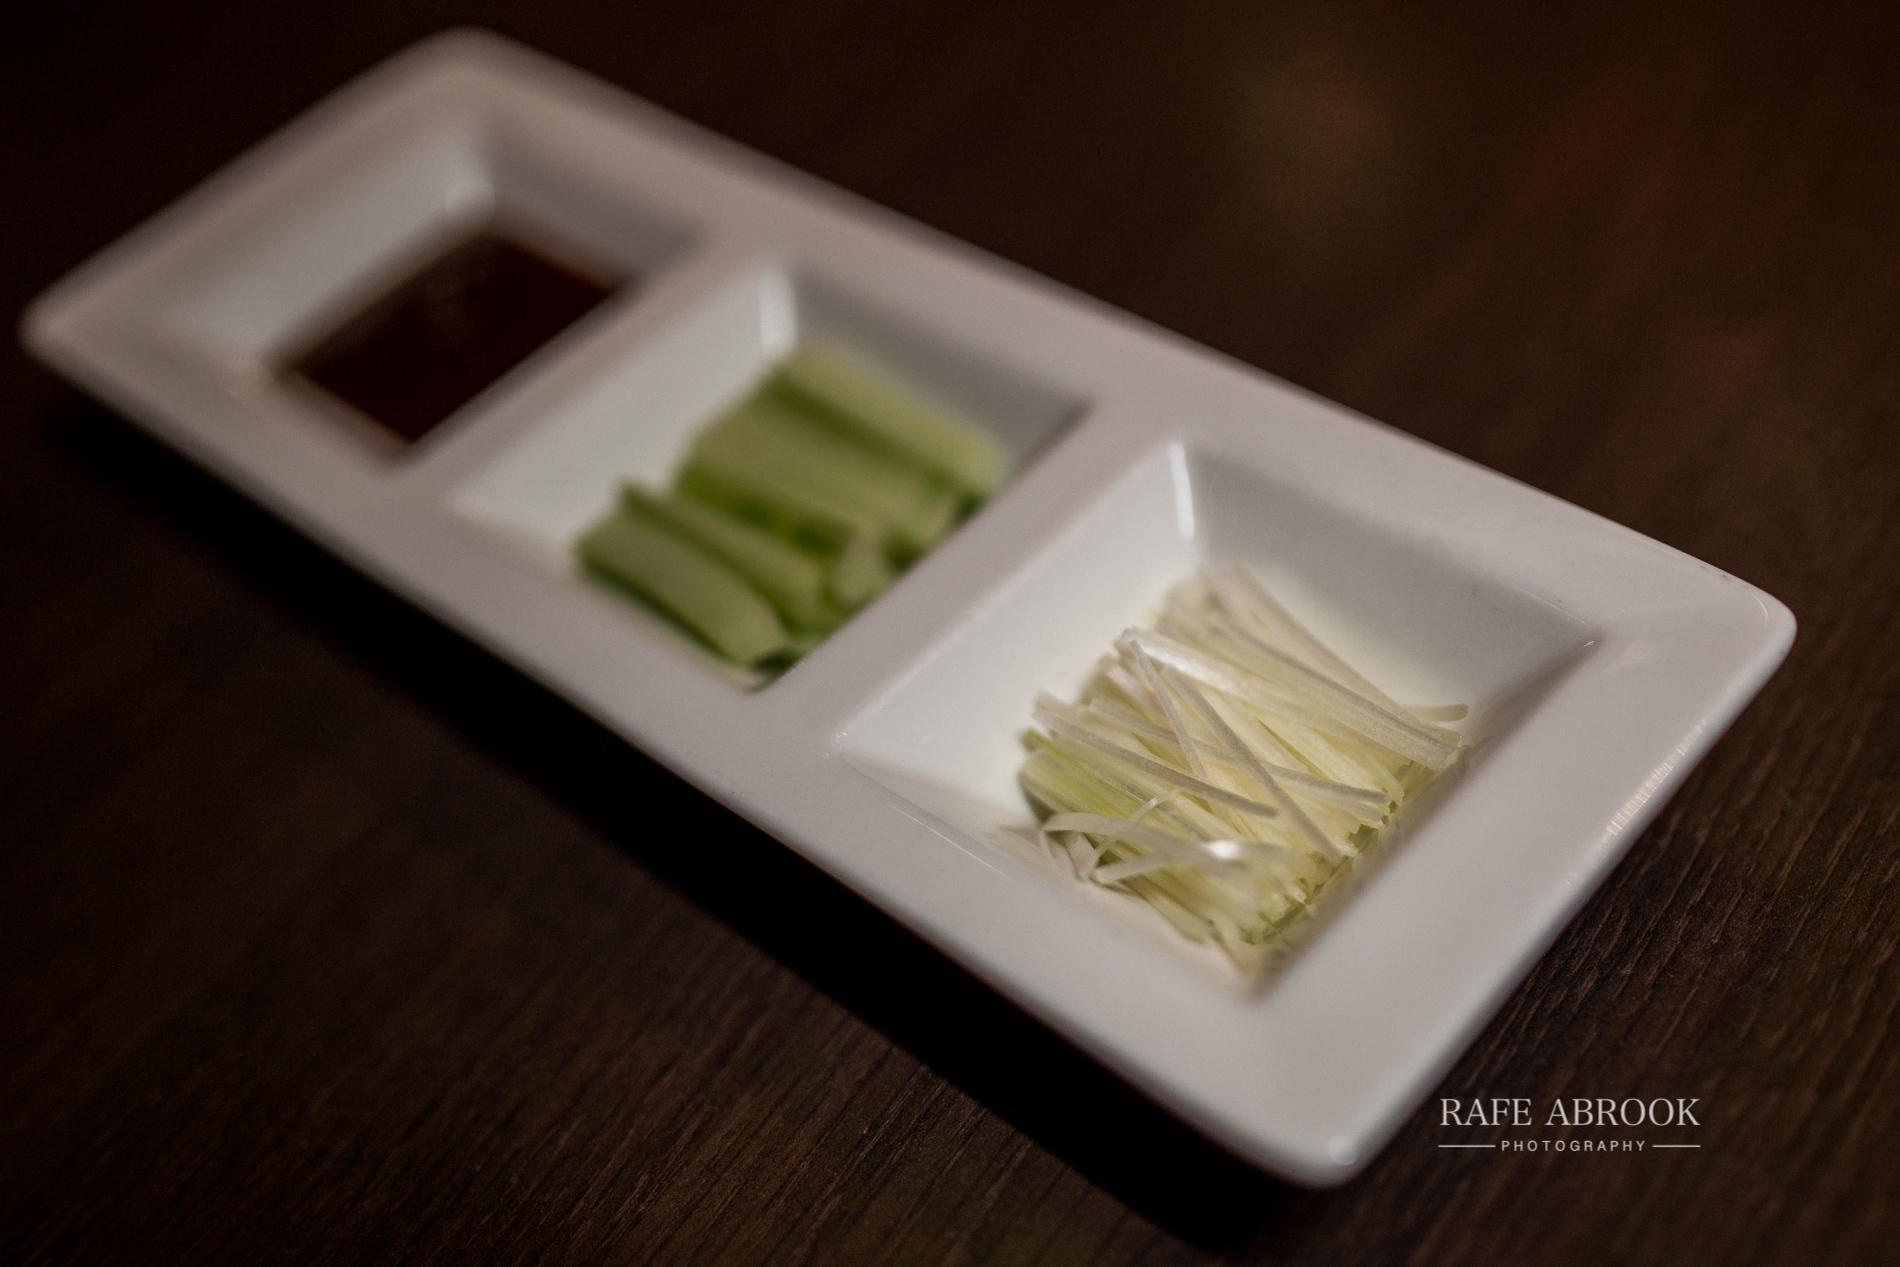 min jiang food blogger rafe abrook photography training-1002.jpg